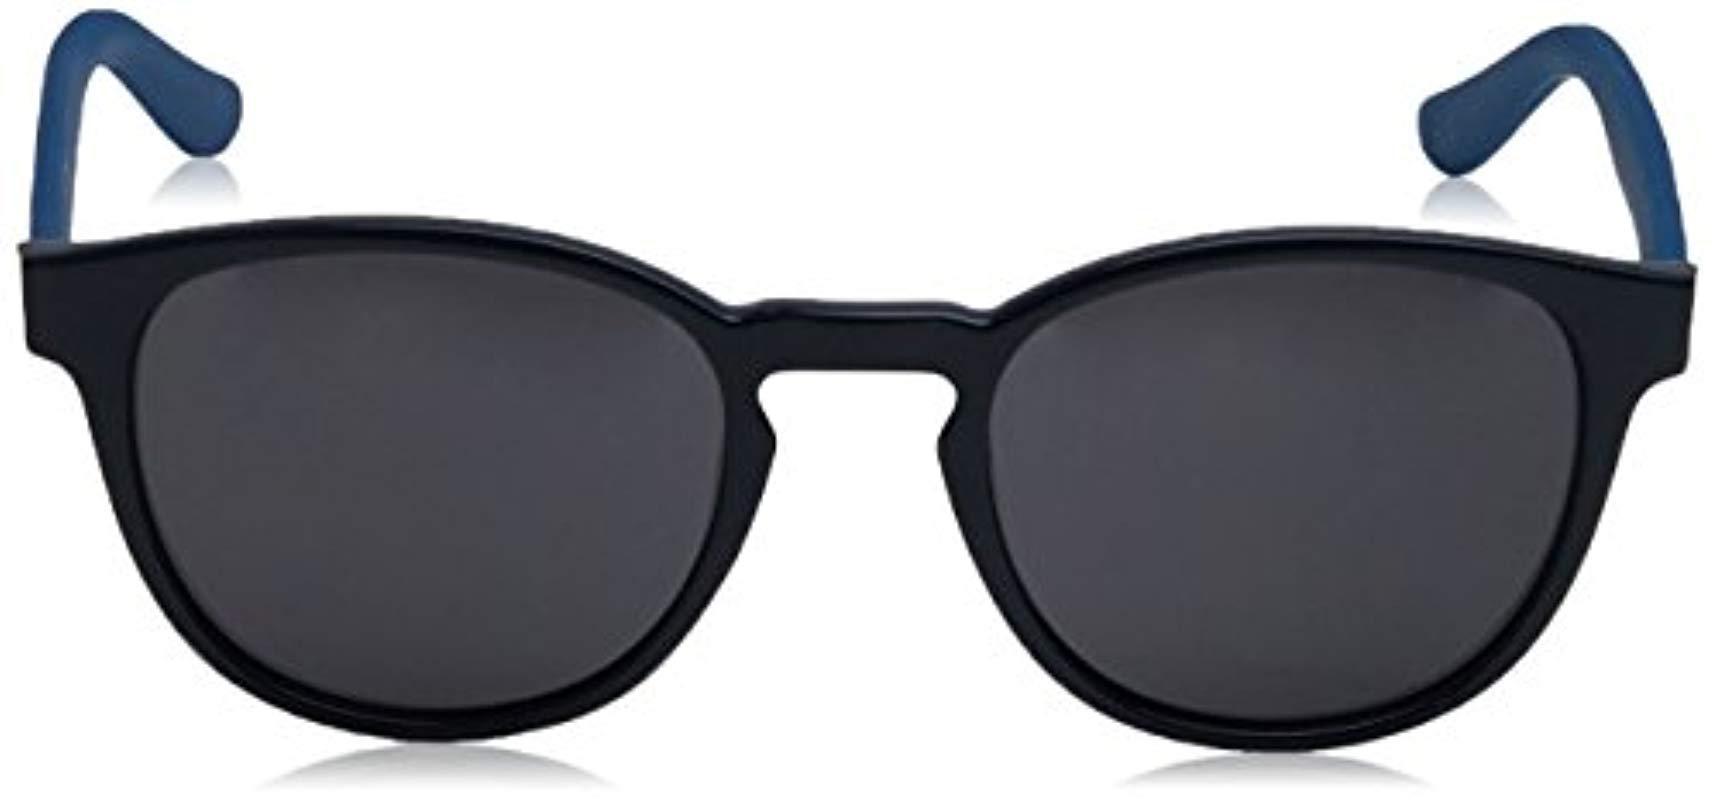 Hilfiger Unisex Blue 1422s Sunglasses completa pantalla Ver Adultos 52 Th Ir Tommy a fO6x1nOa